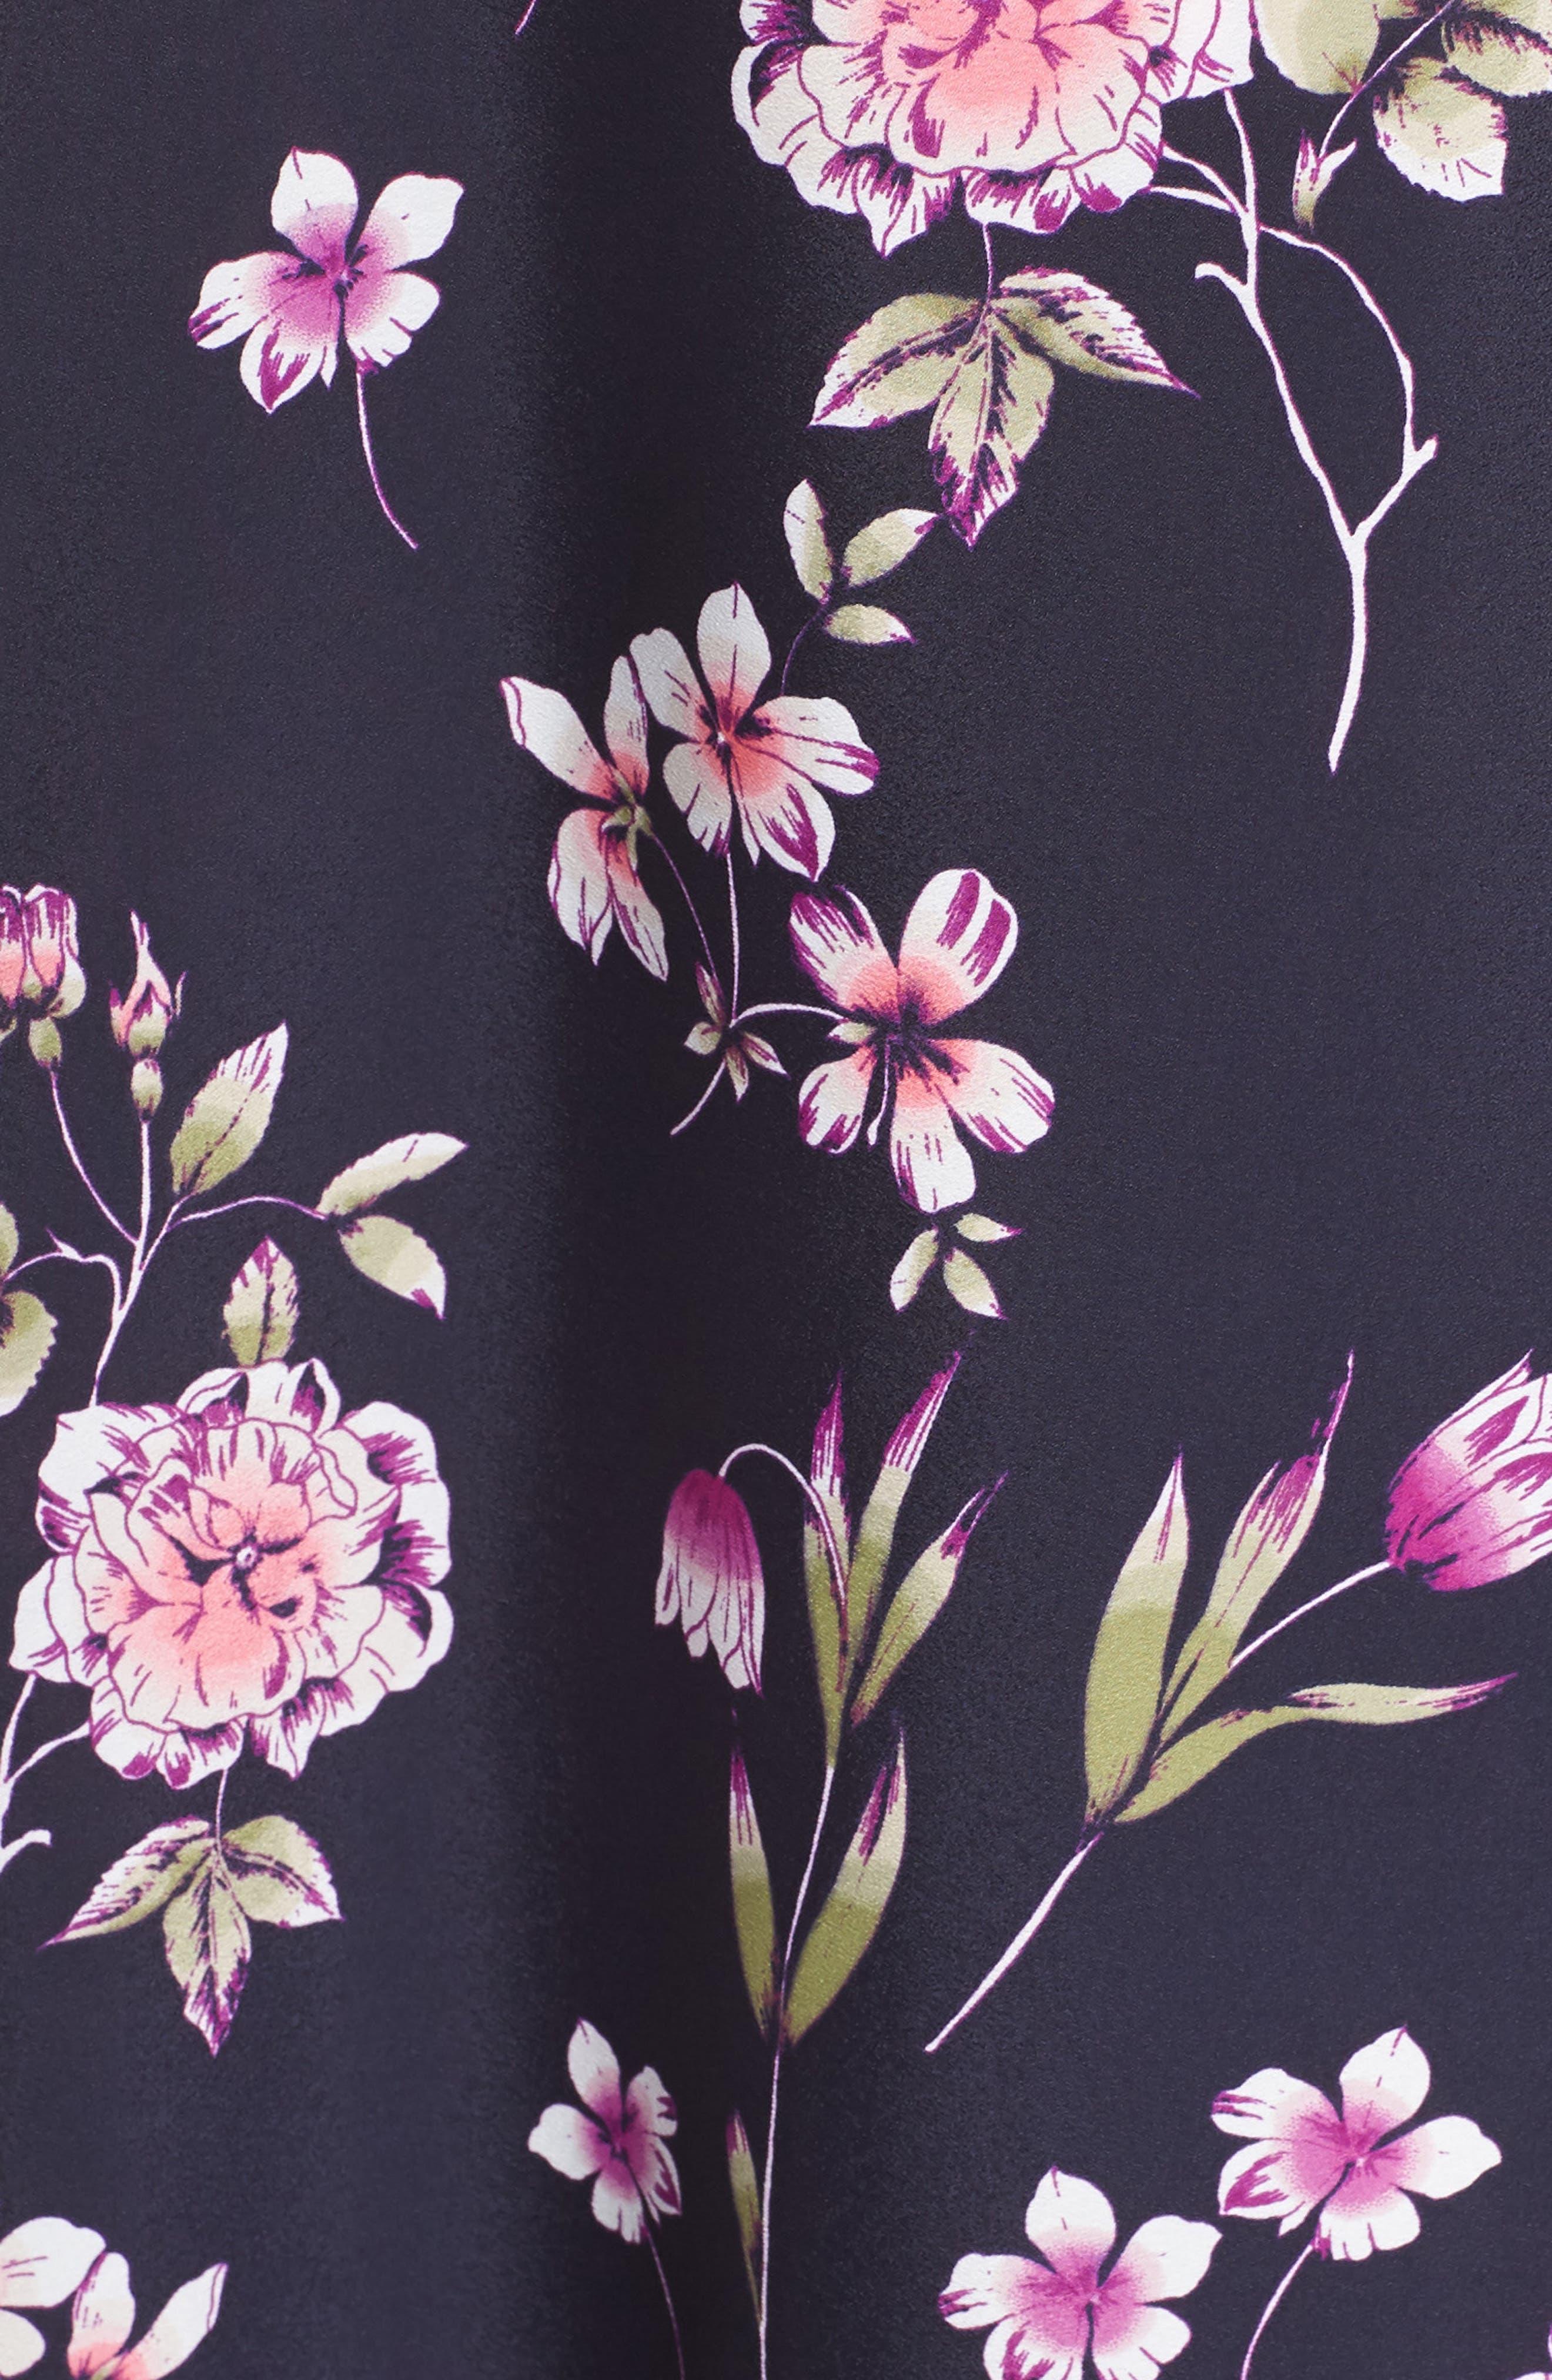 Floral Print Wrap Dress,                             Alternate thumbnail 6, color,                             NAVY